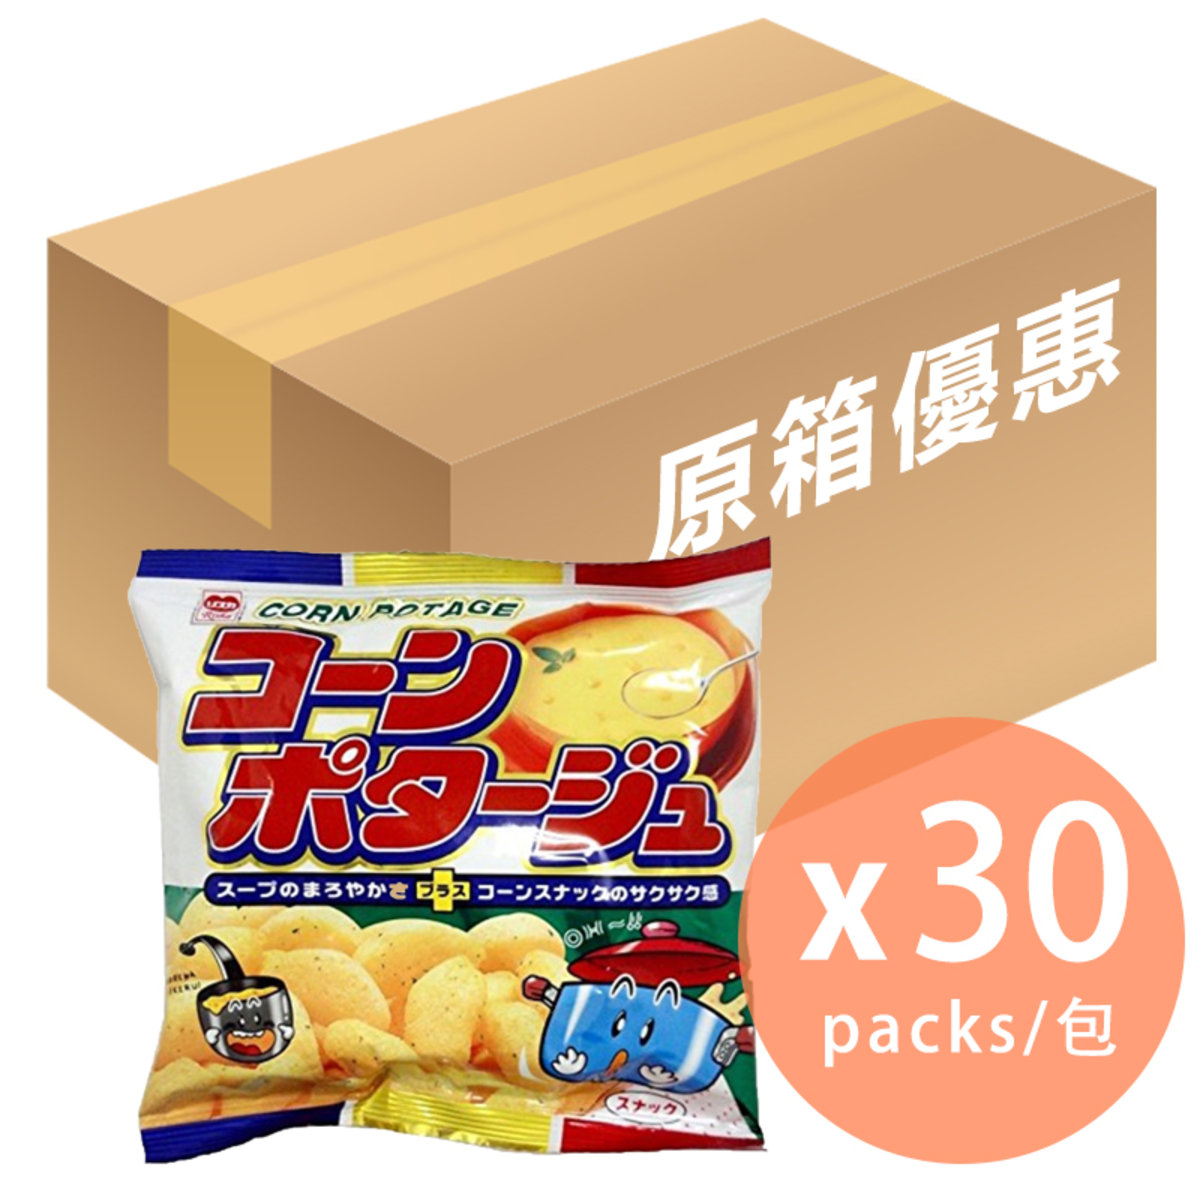 Rich corn soup crispy ball ( small size 20g) x 30 bags (4903013030018_30)